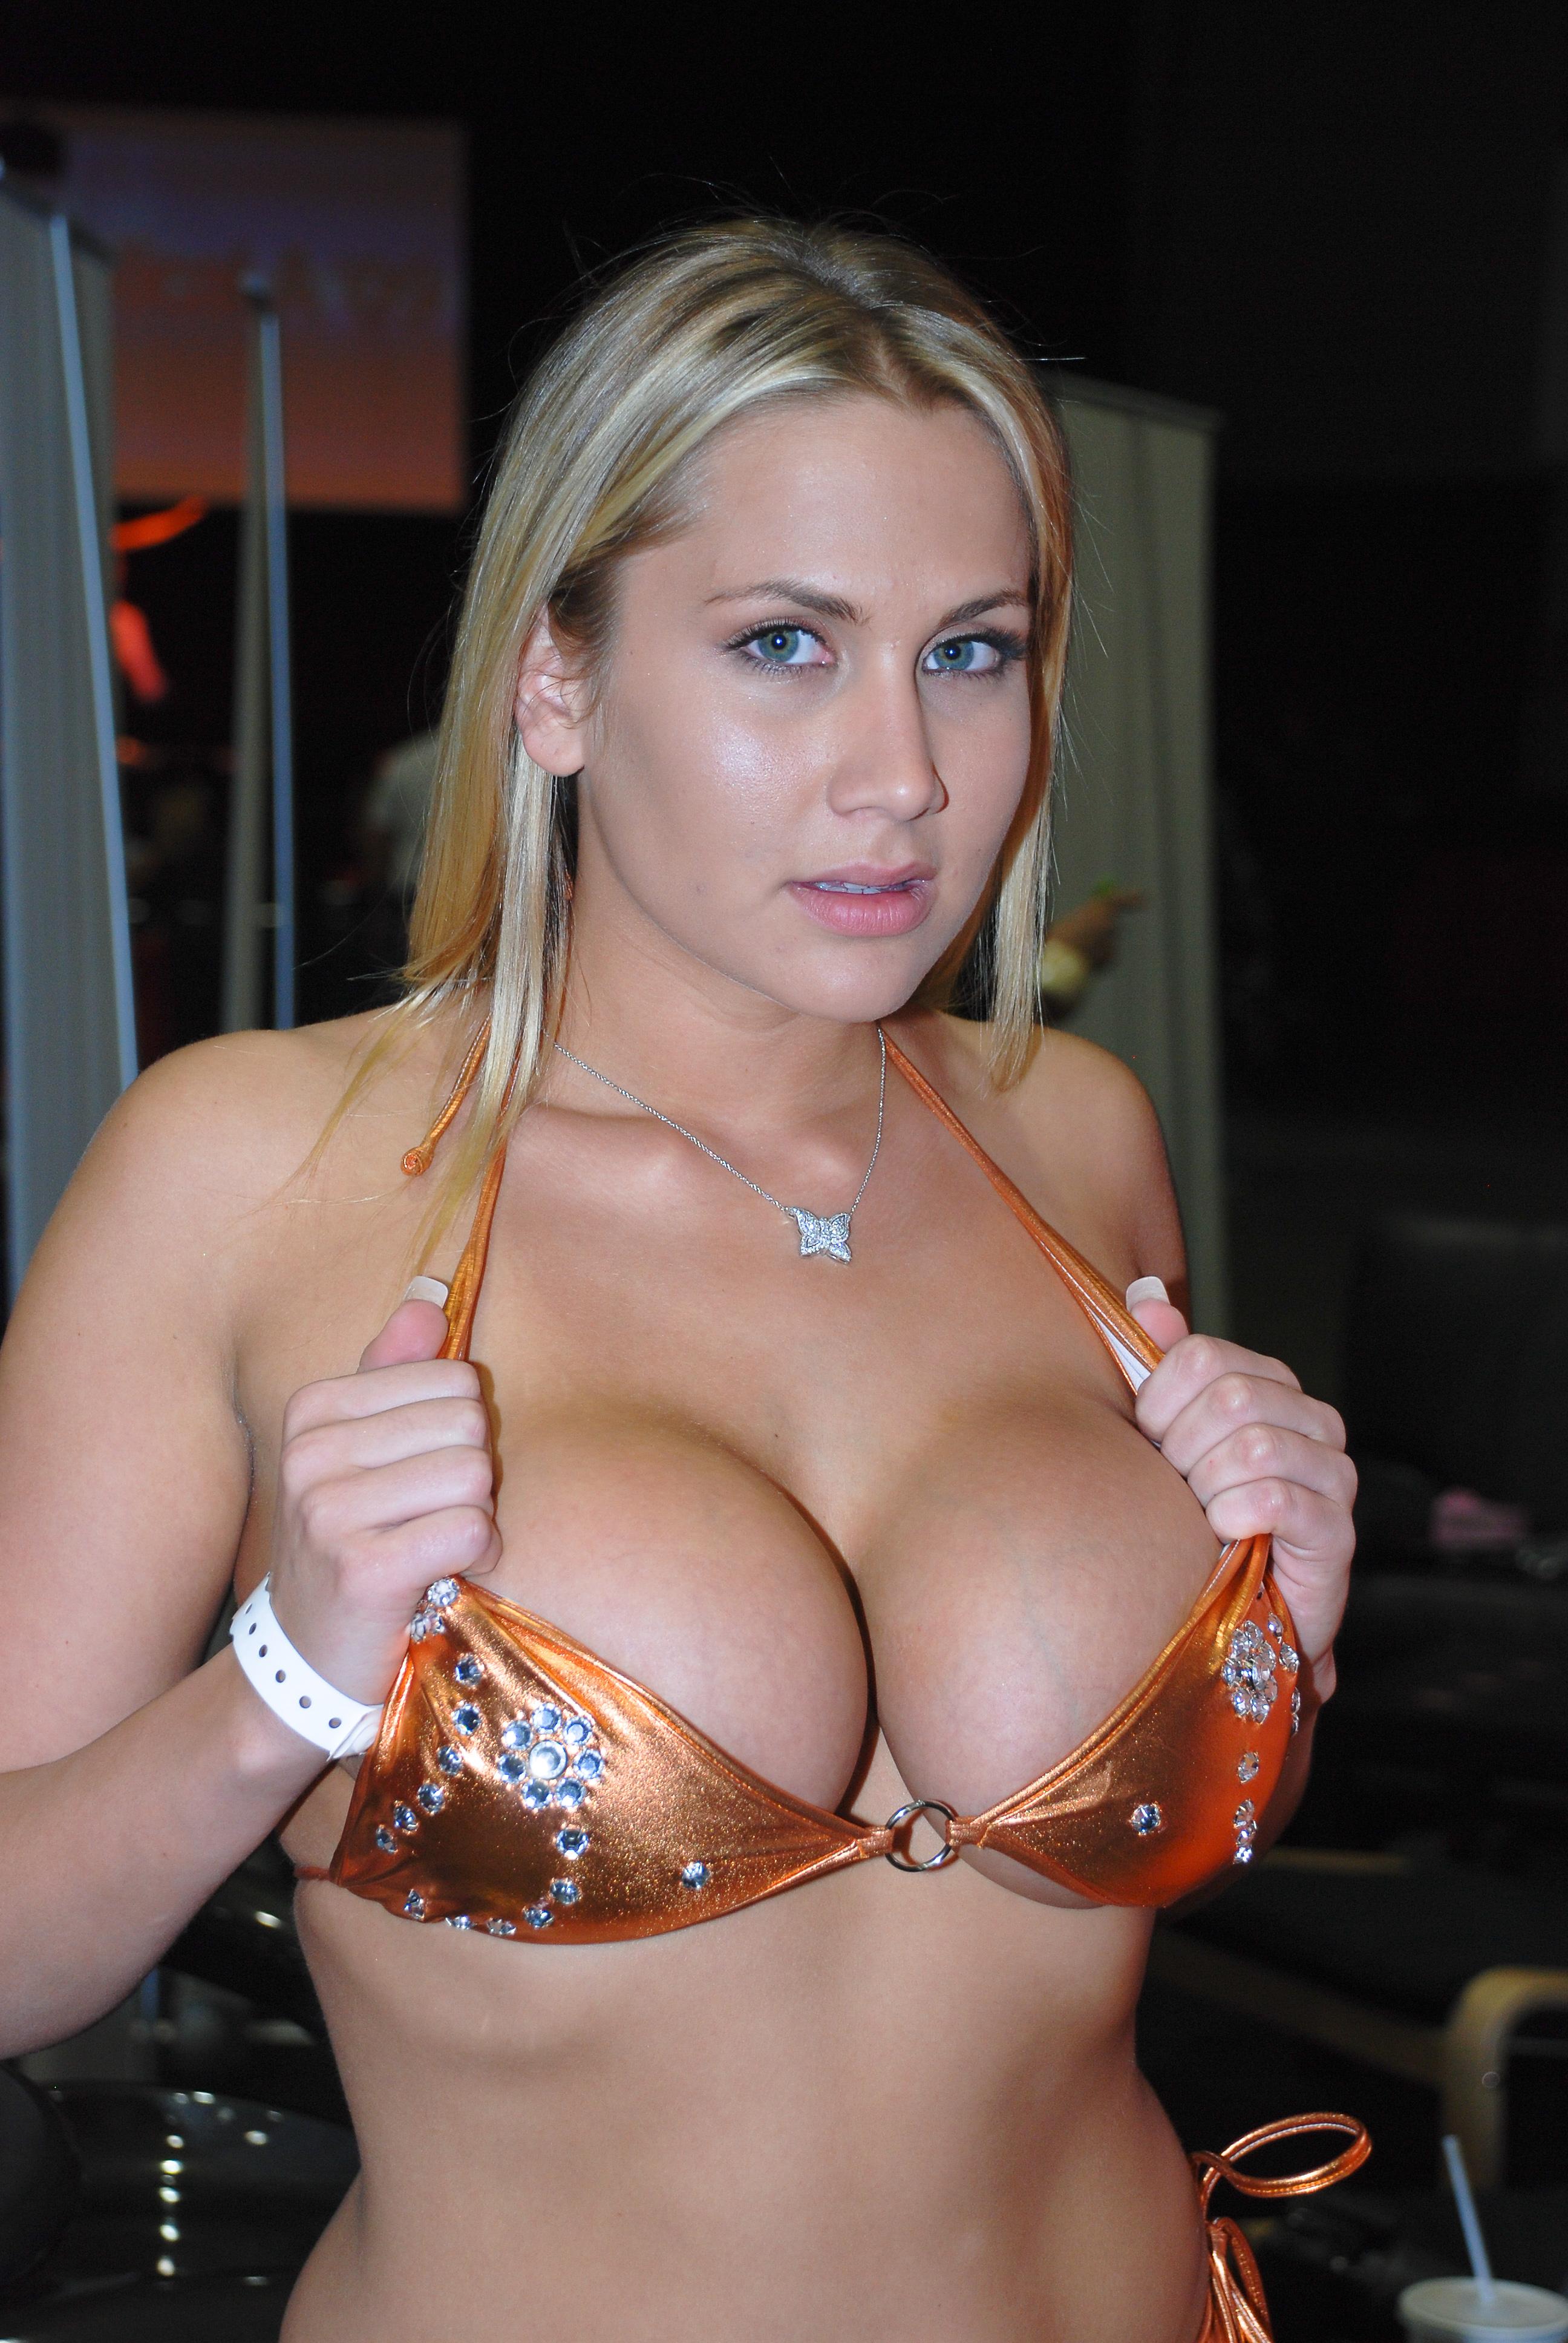 Alanah rae hot nude bra